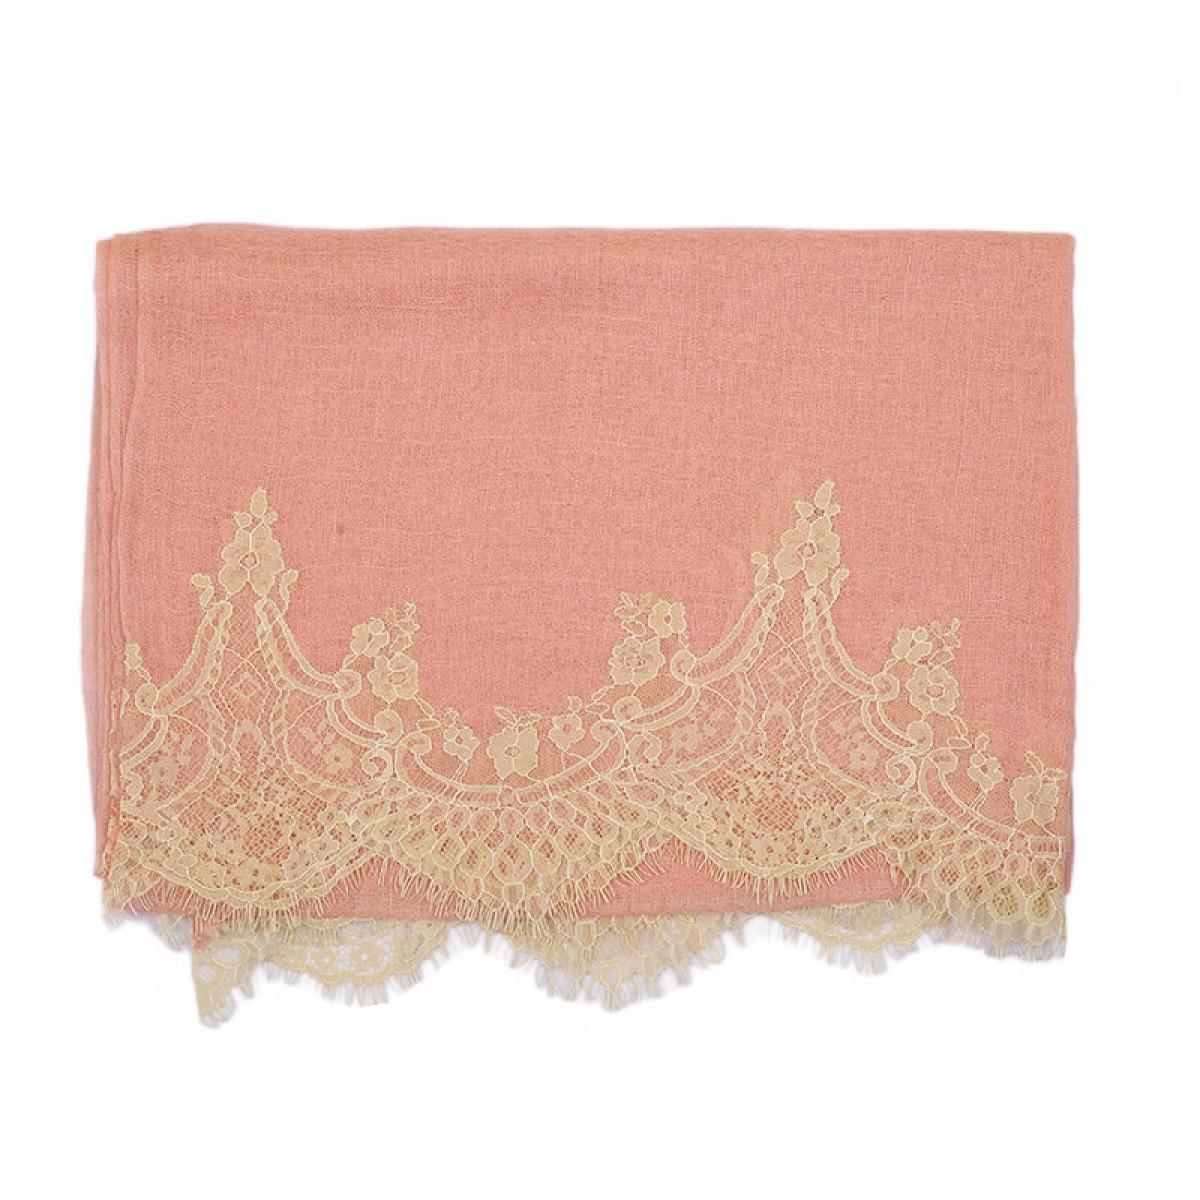 Lace Sheer Pashmina Scarf - Apricot Blush